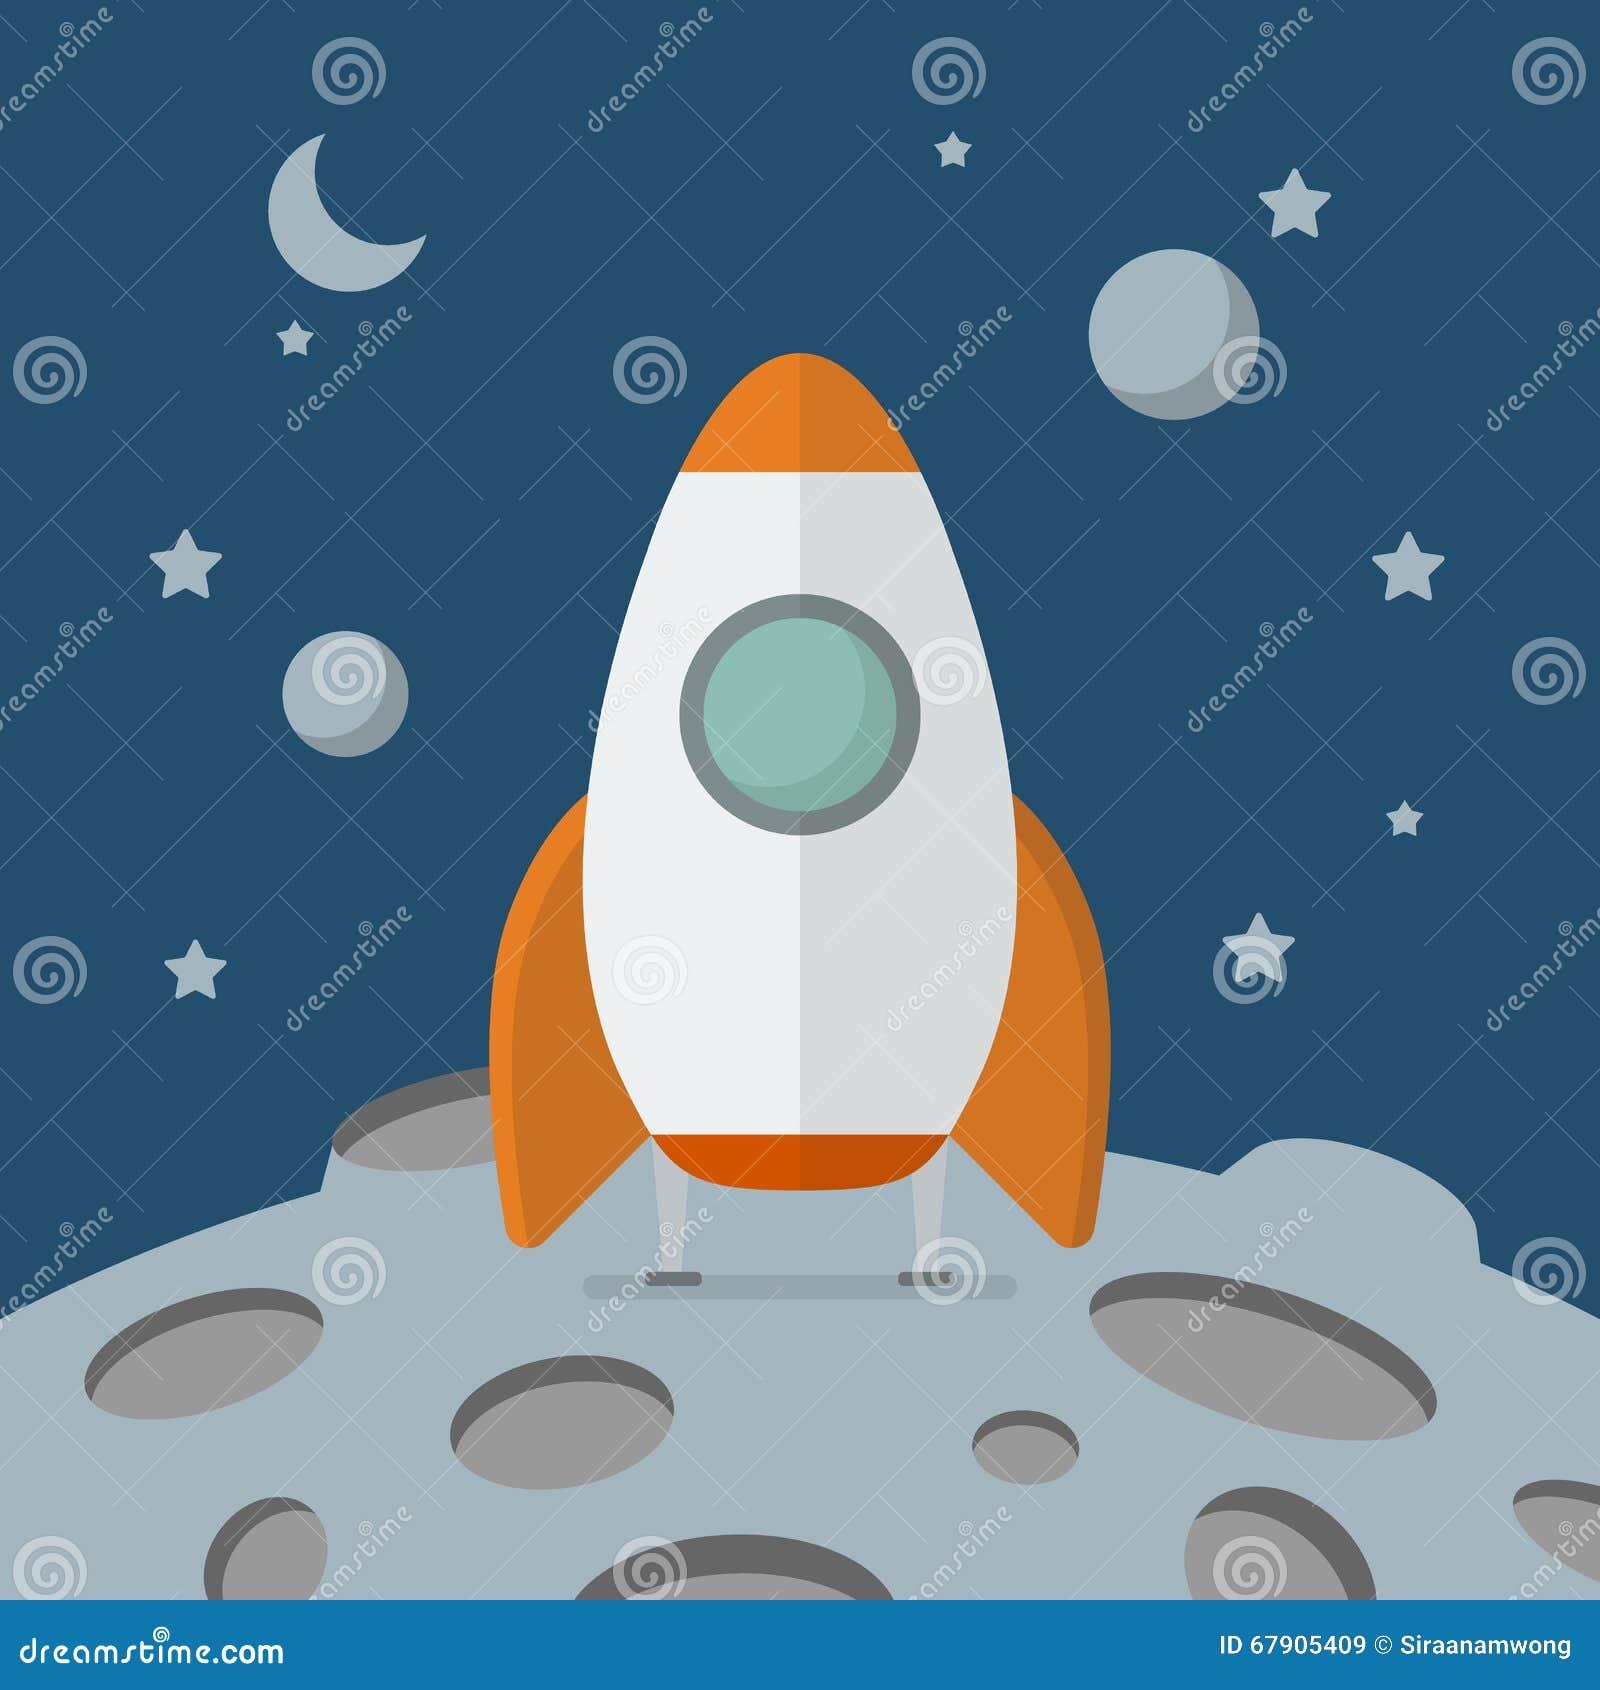 rocket landing on moon - photo #33